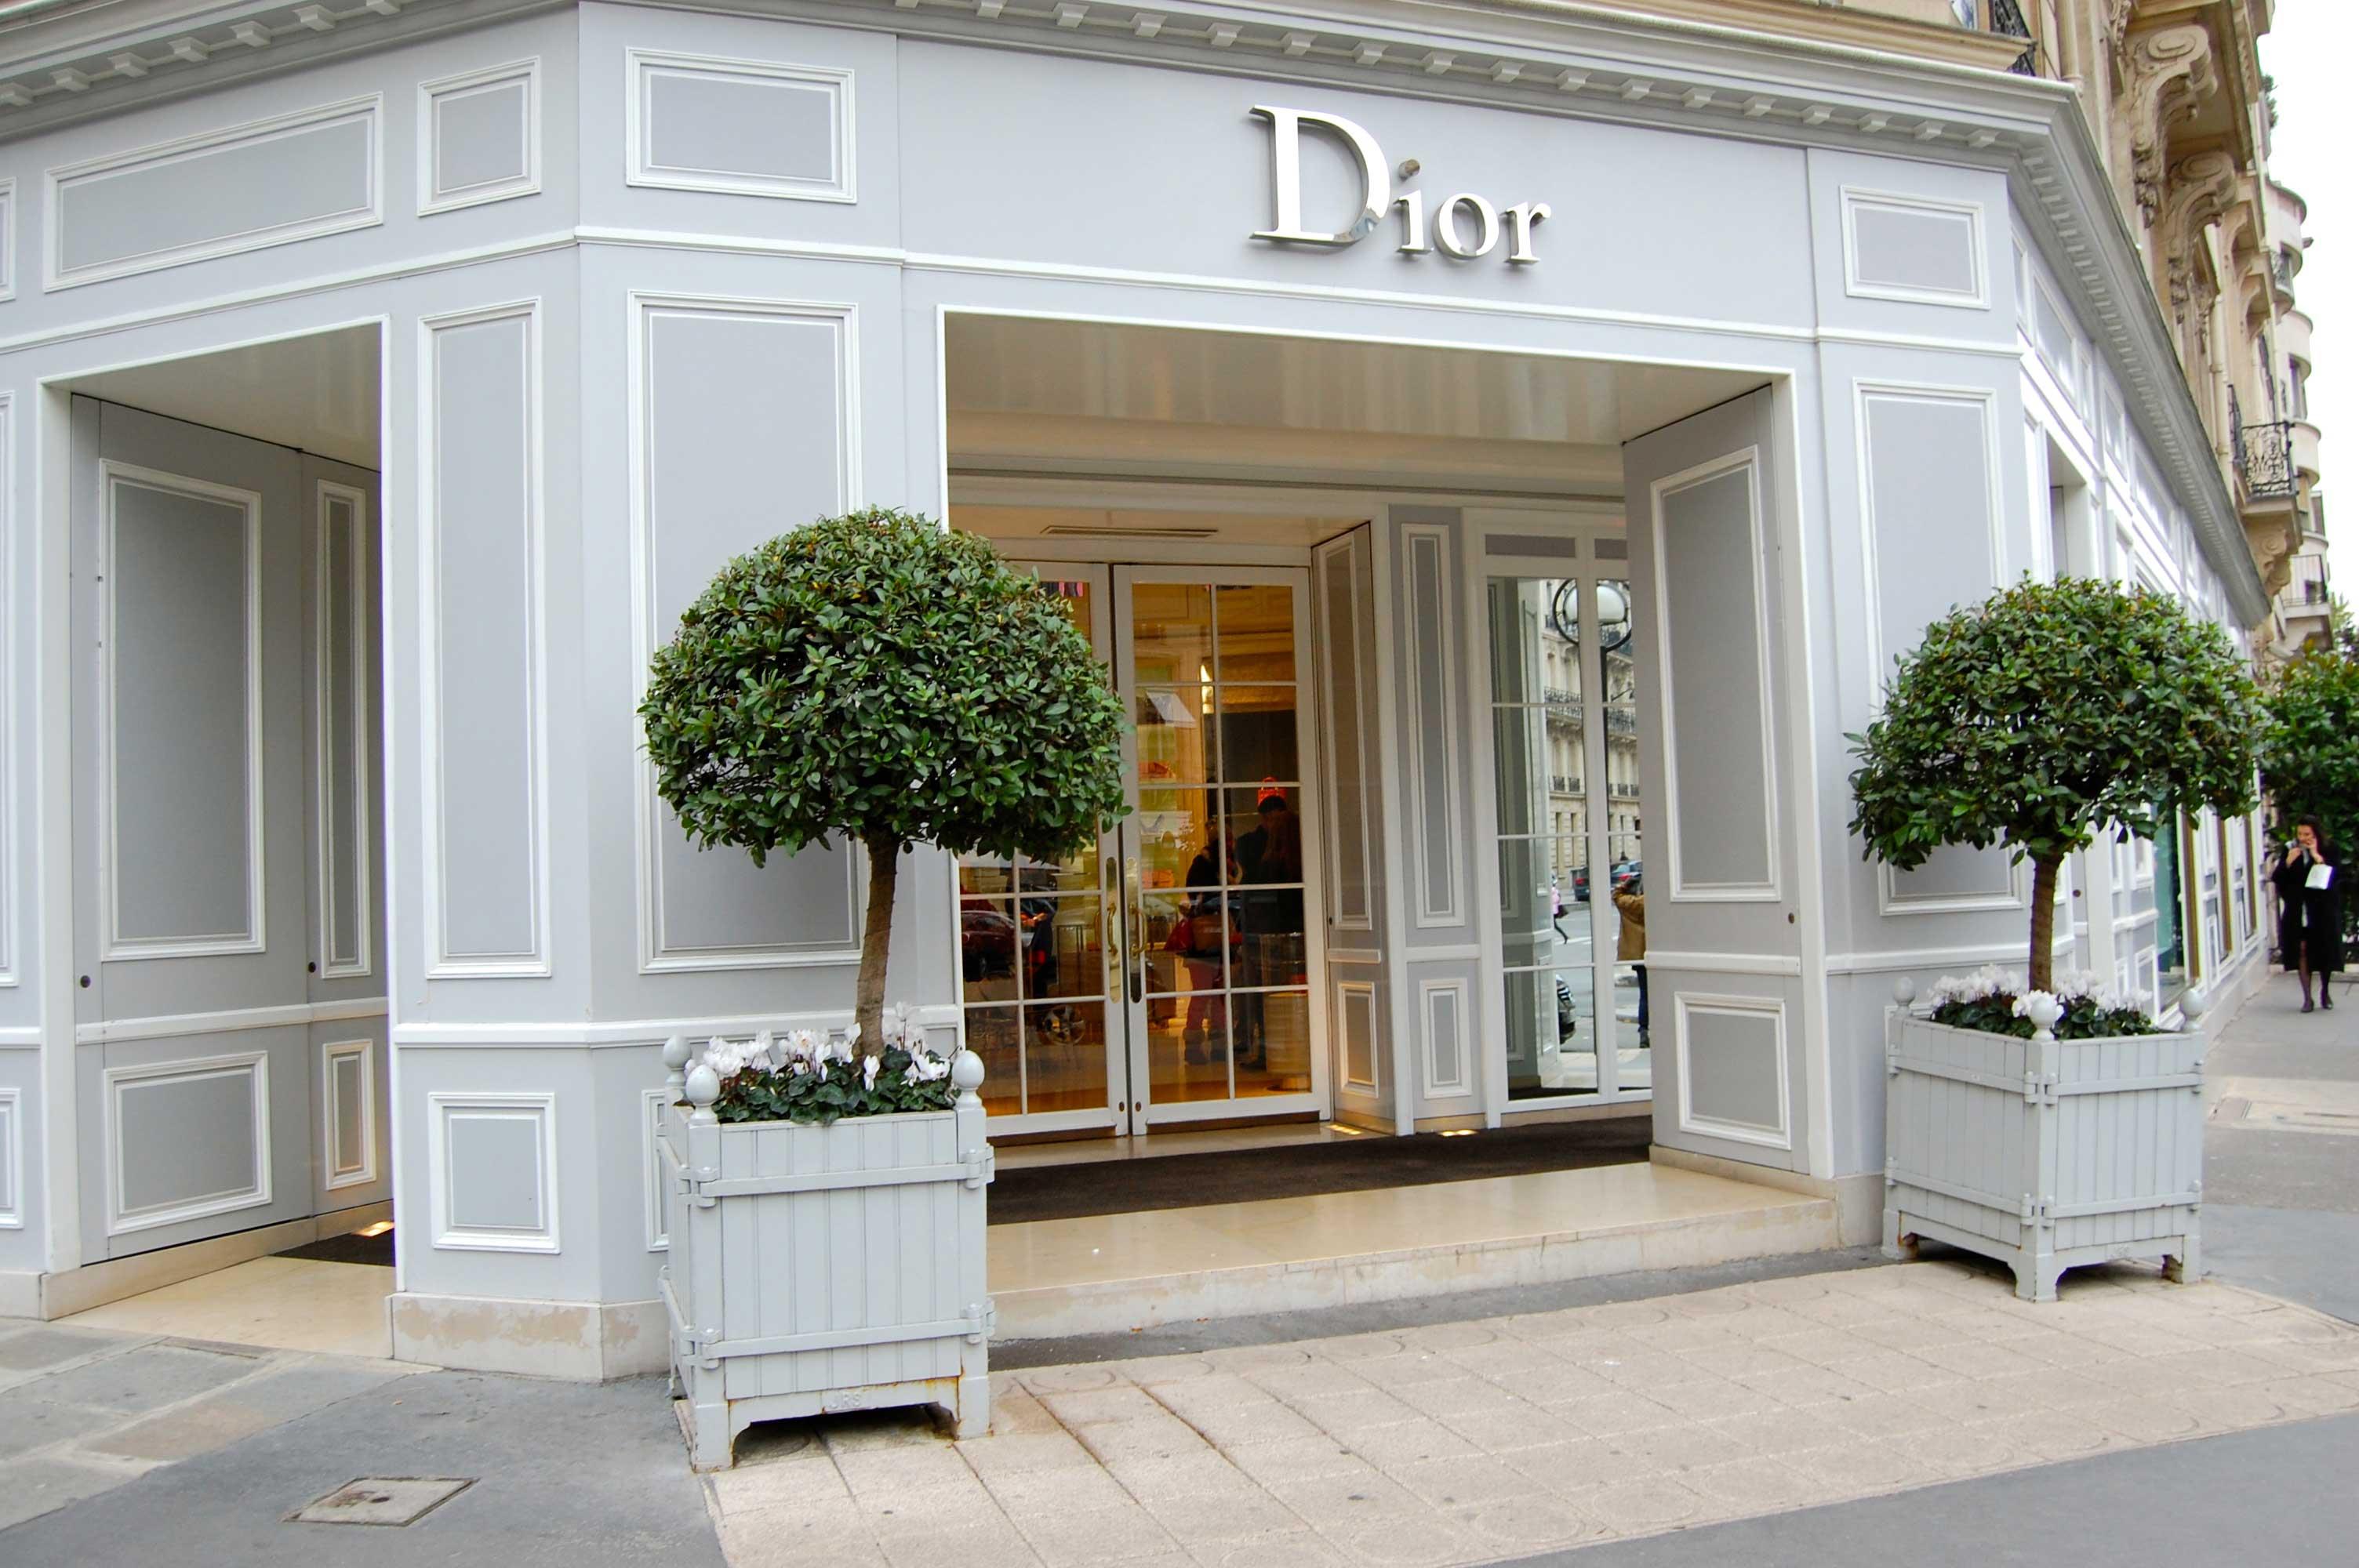 02_Dior